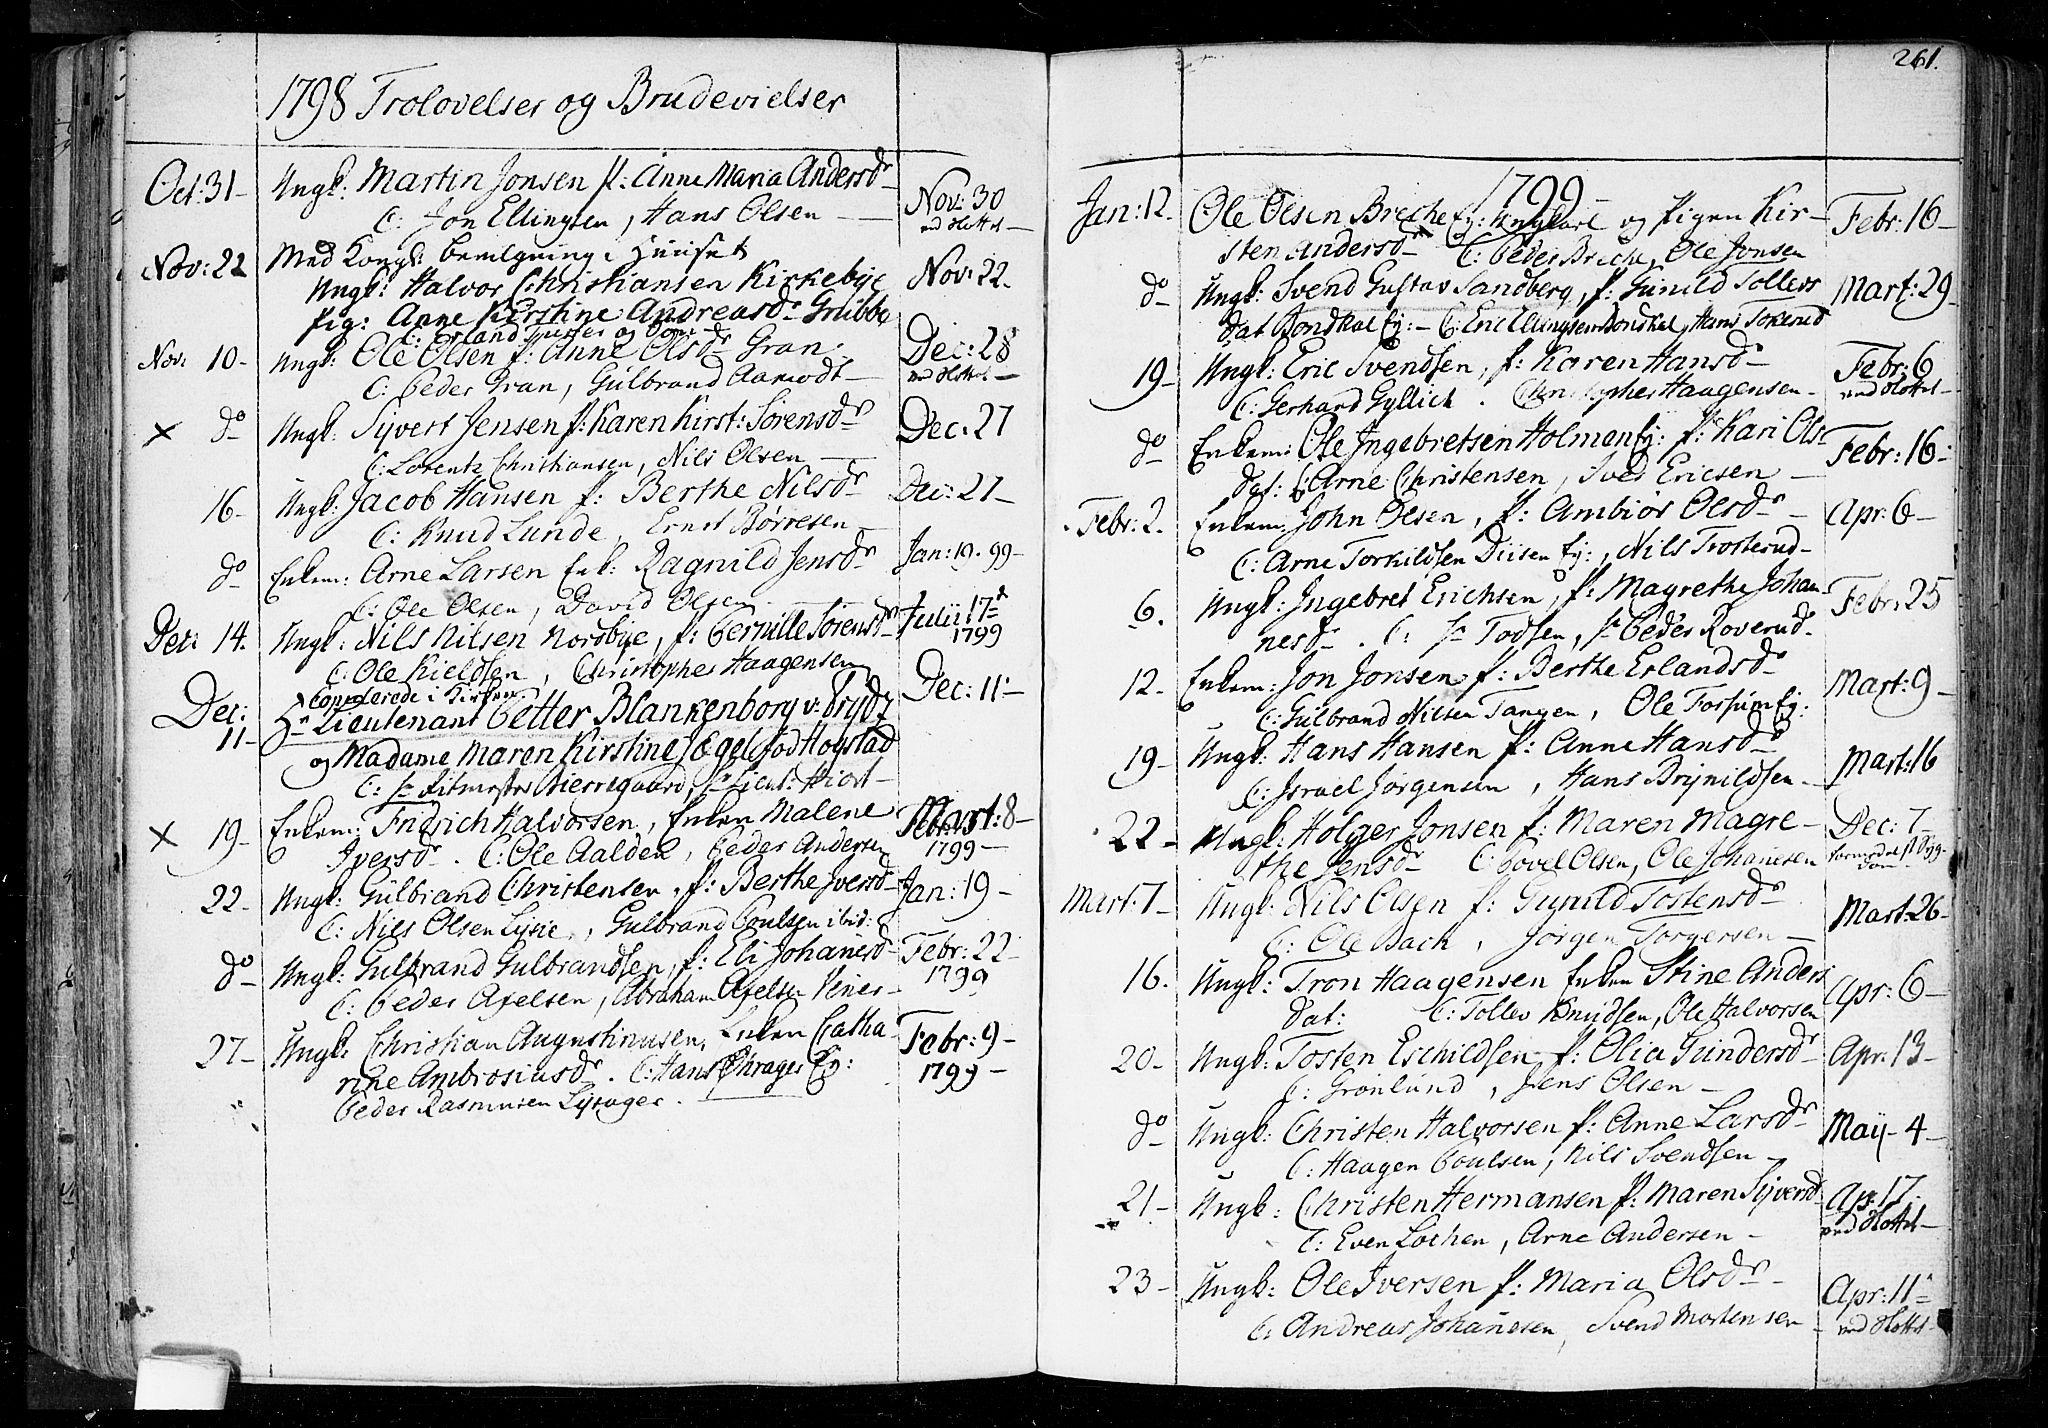 SAO, Aker prestekontor kirkebøker, F/L0010: Parish register (official) no. 10, 1786-1809, p. 261